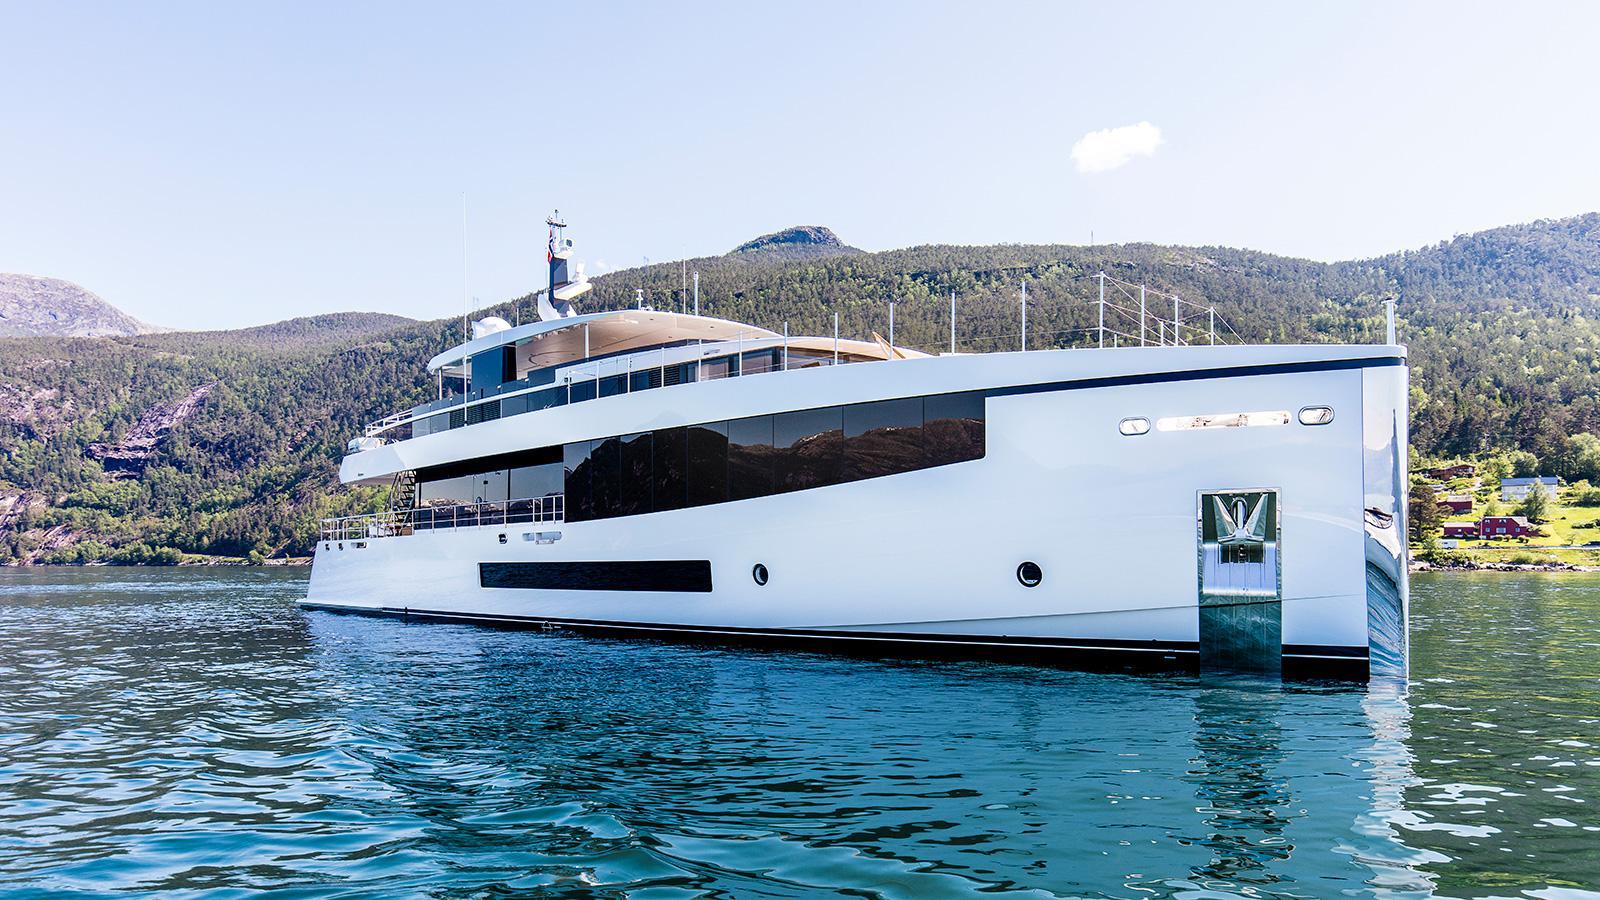 Kamino-super-yacht-feadship-2016-34-metres-bow